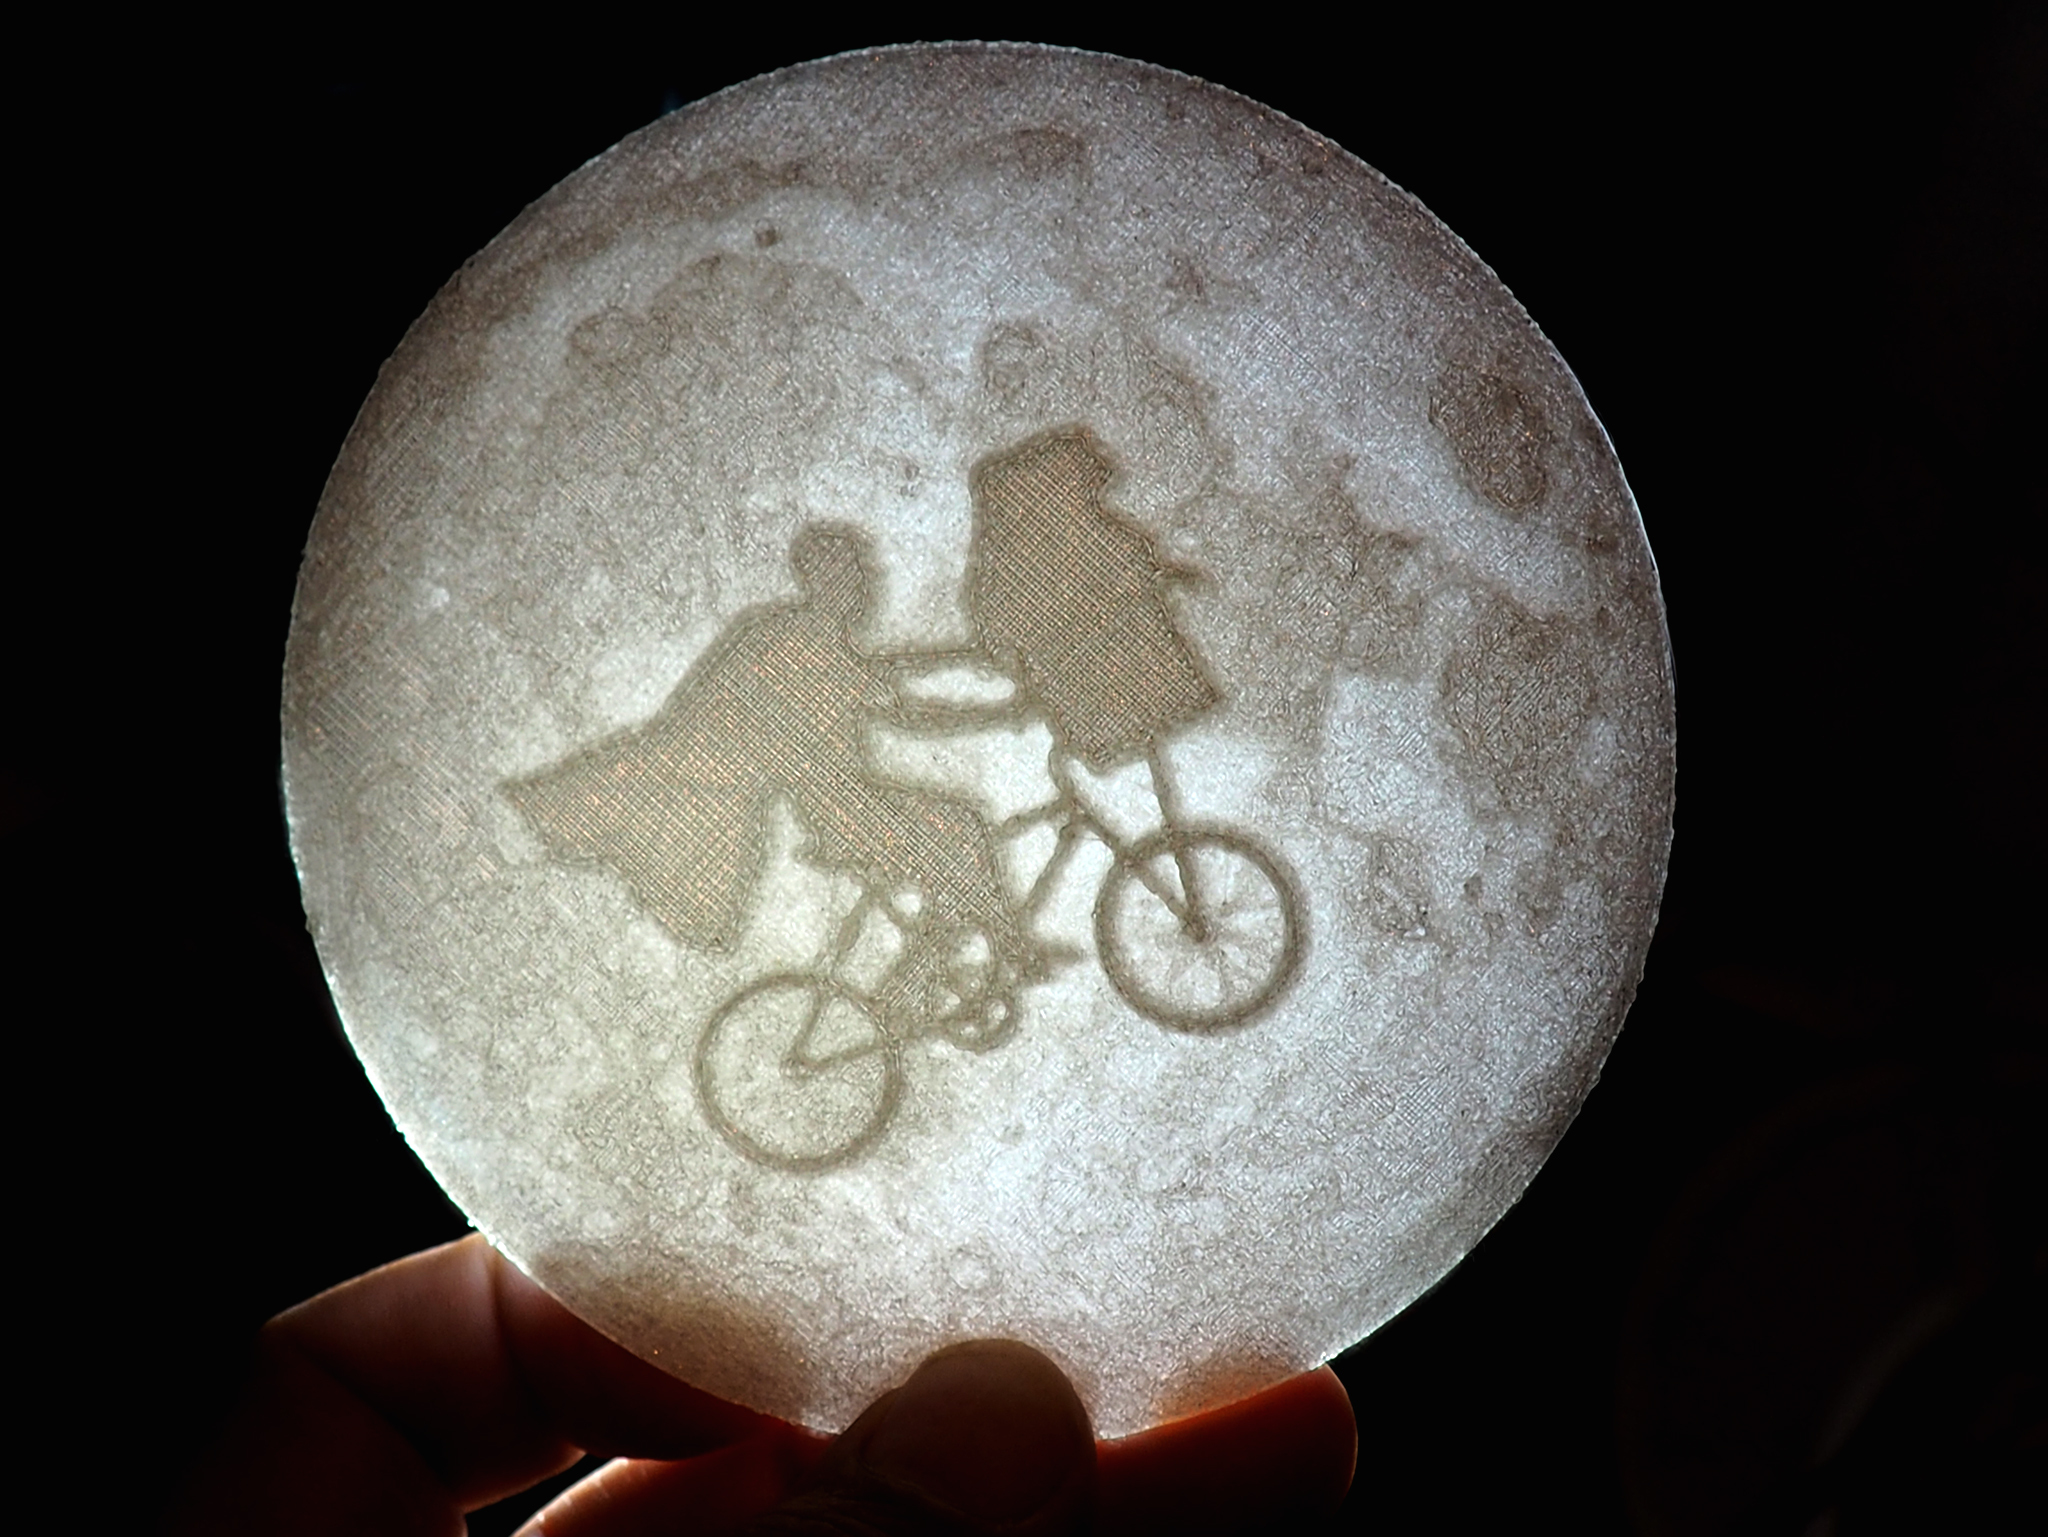 foto1.jpg Download free STL file E.T. across the moon litophane • 3D print template, dancingchicken